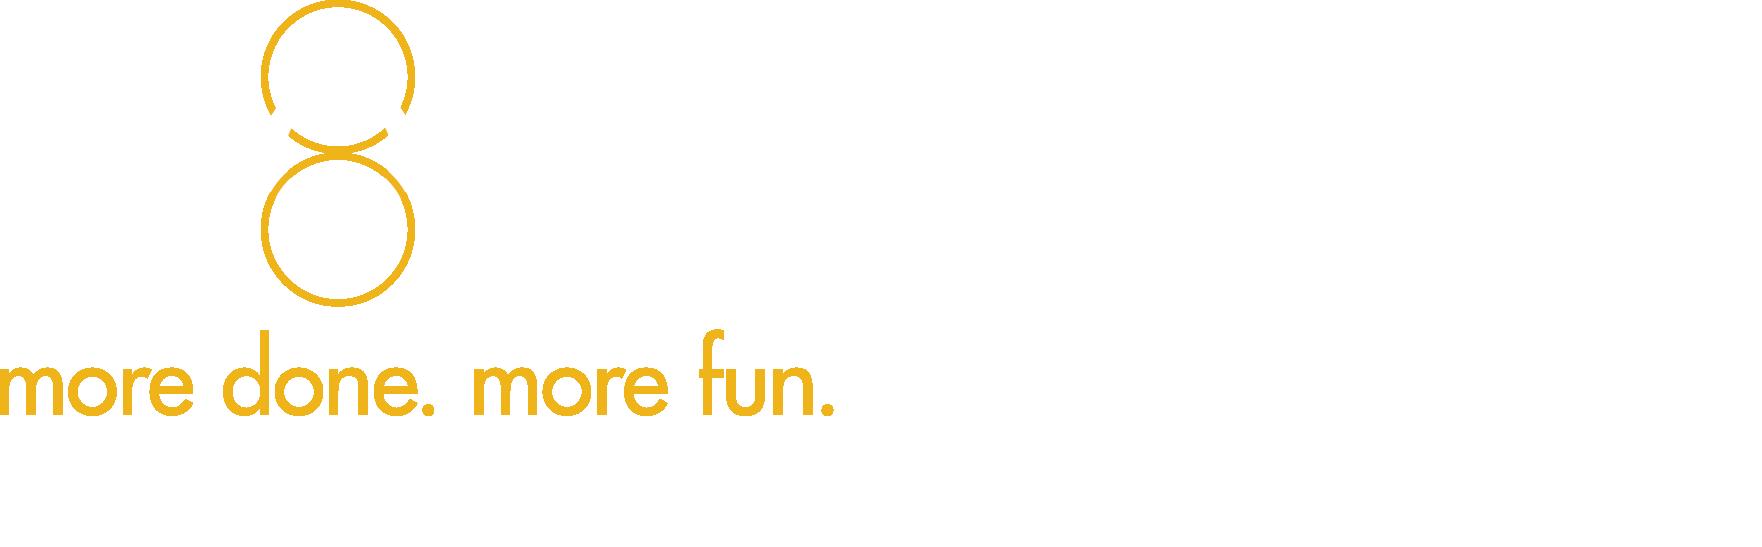 Pronamics More Done More Fun